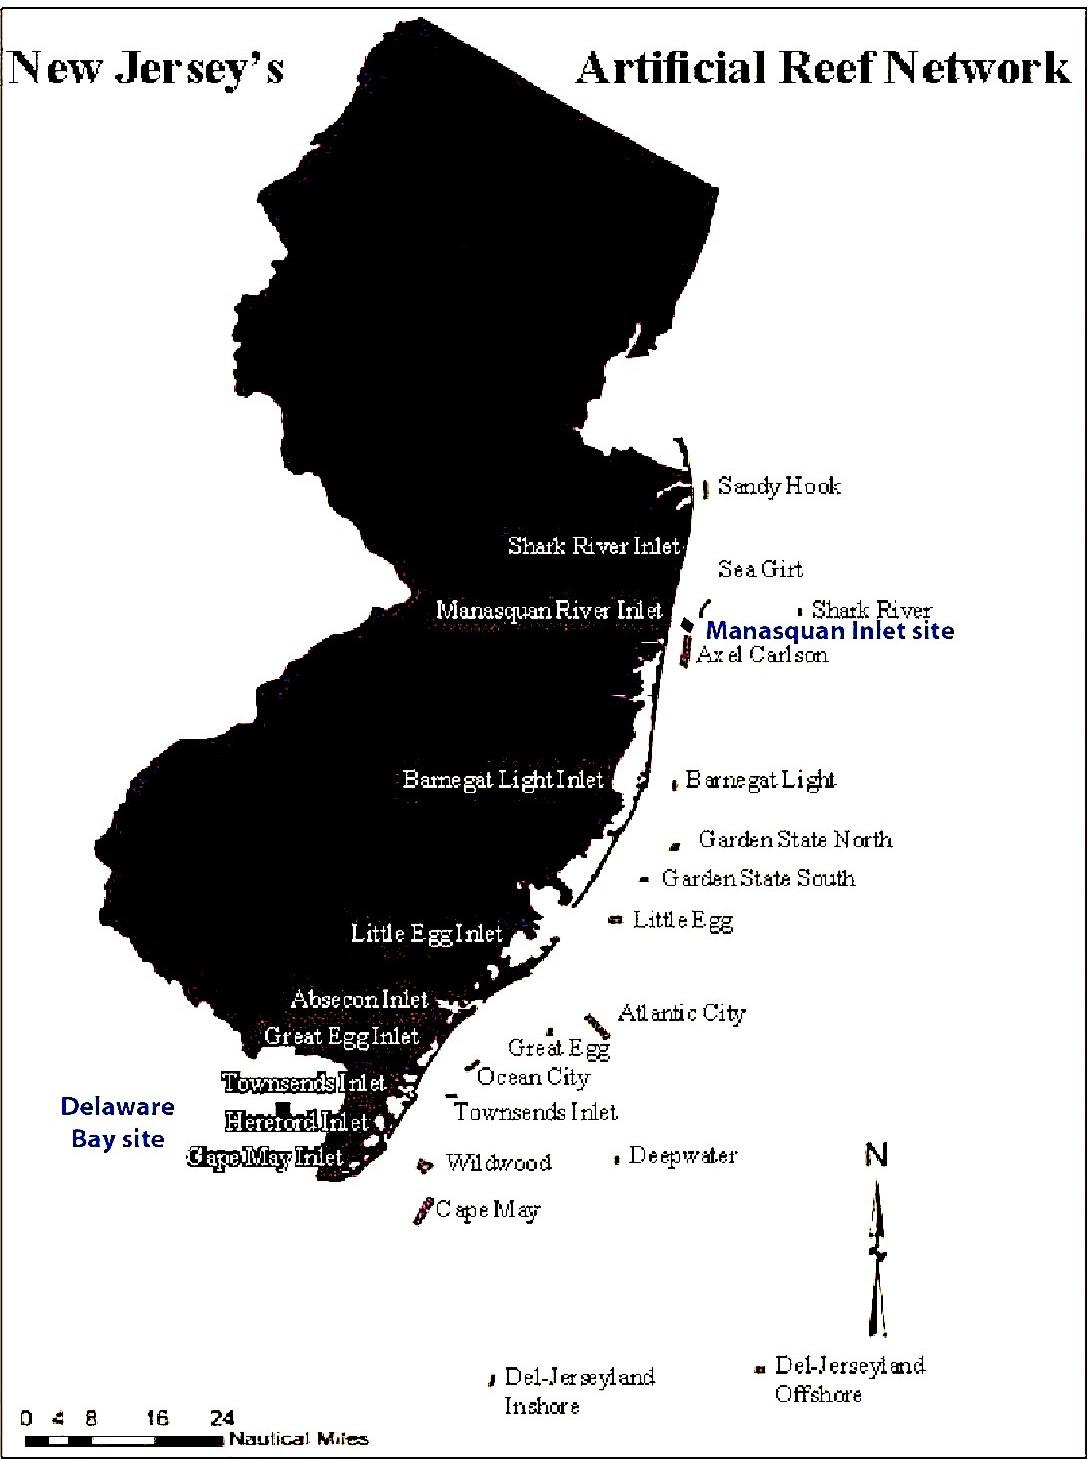 NJ Artificial Reef Network